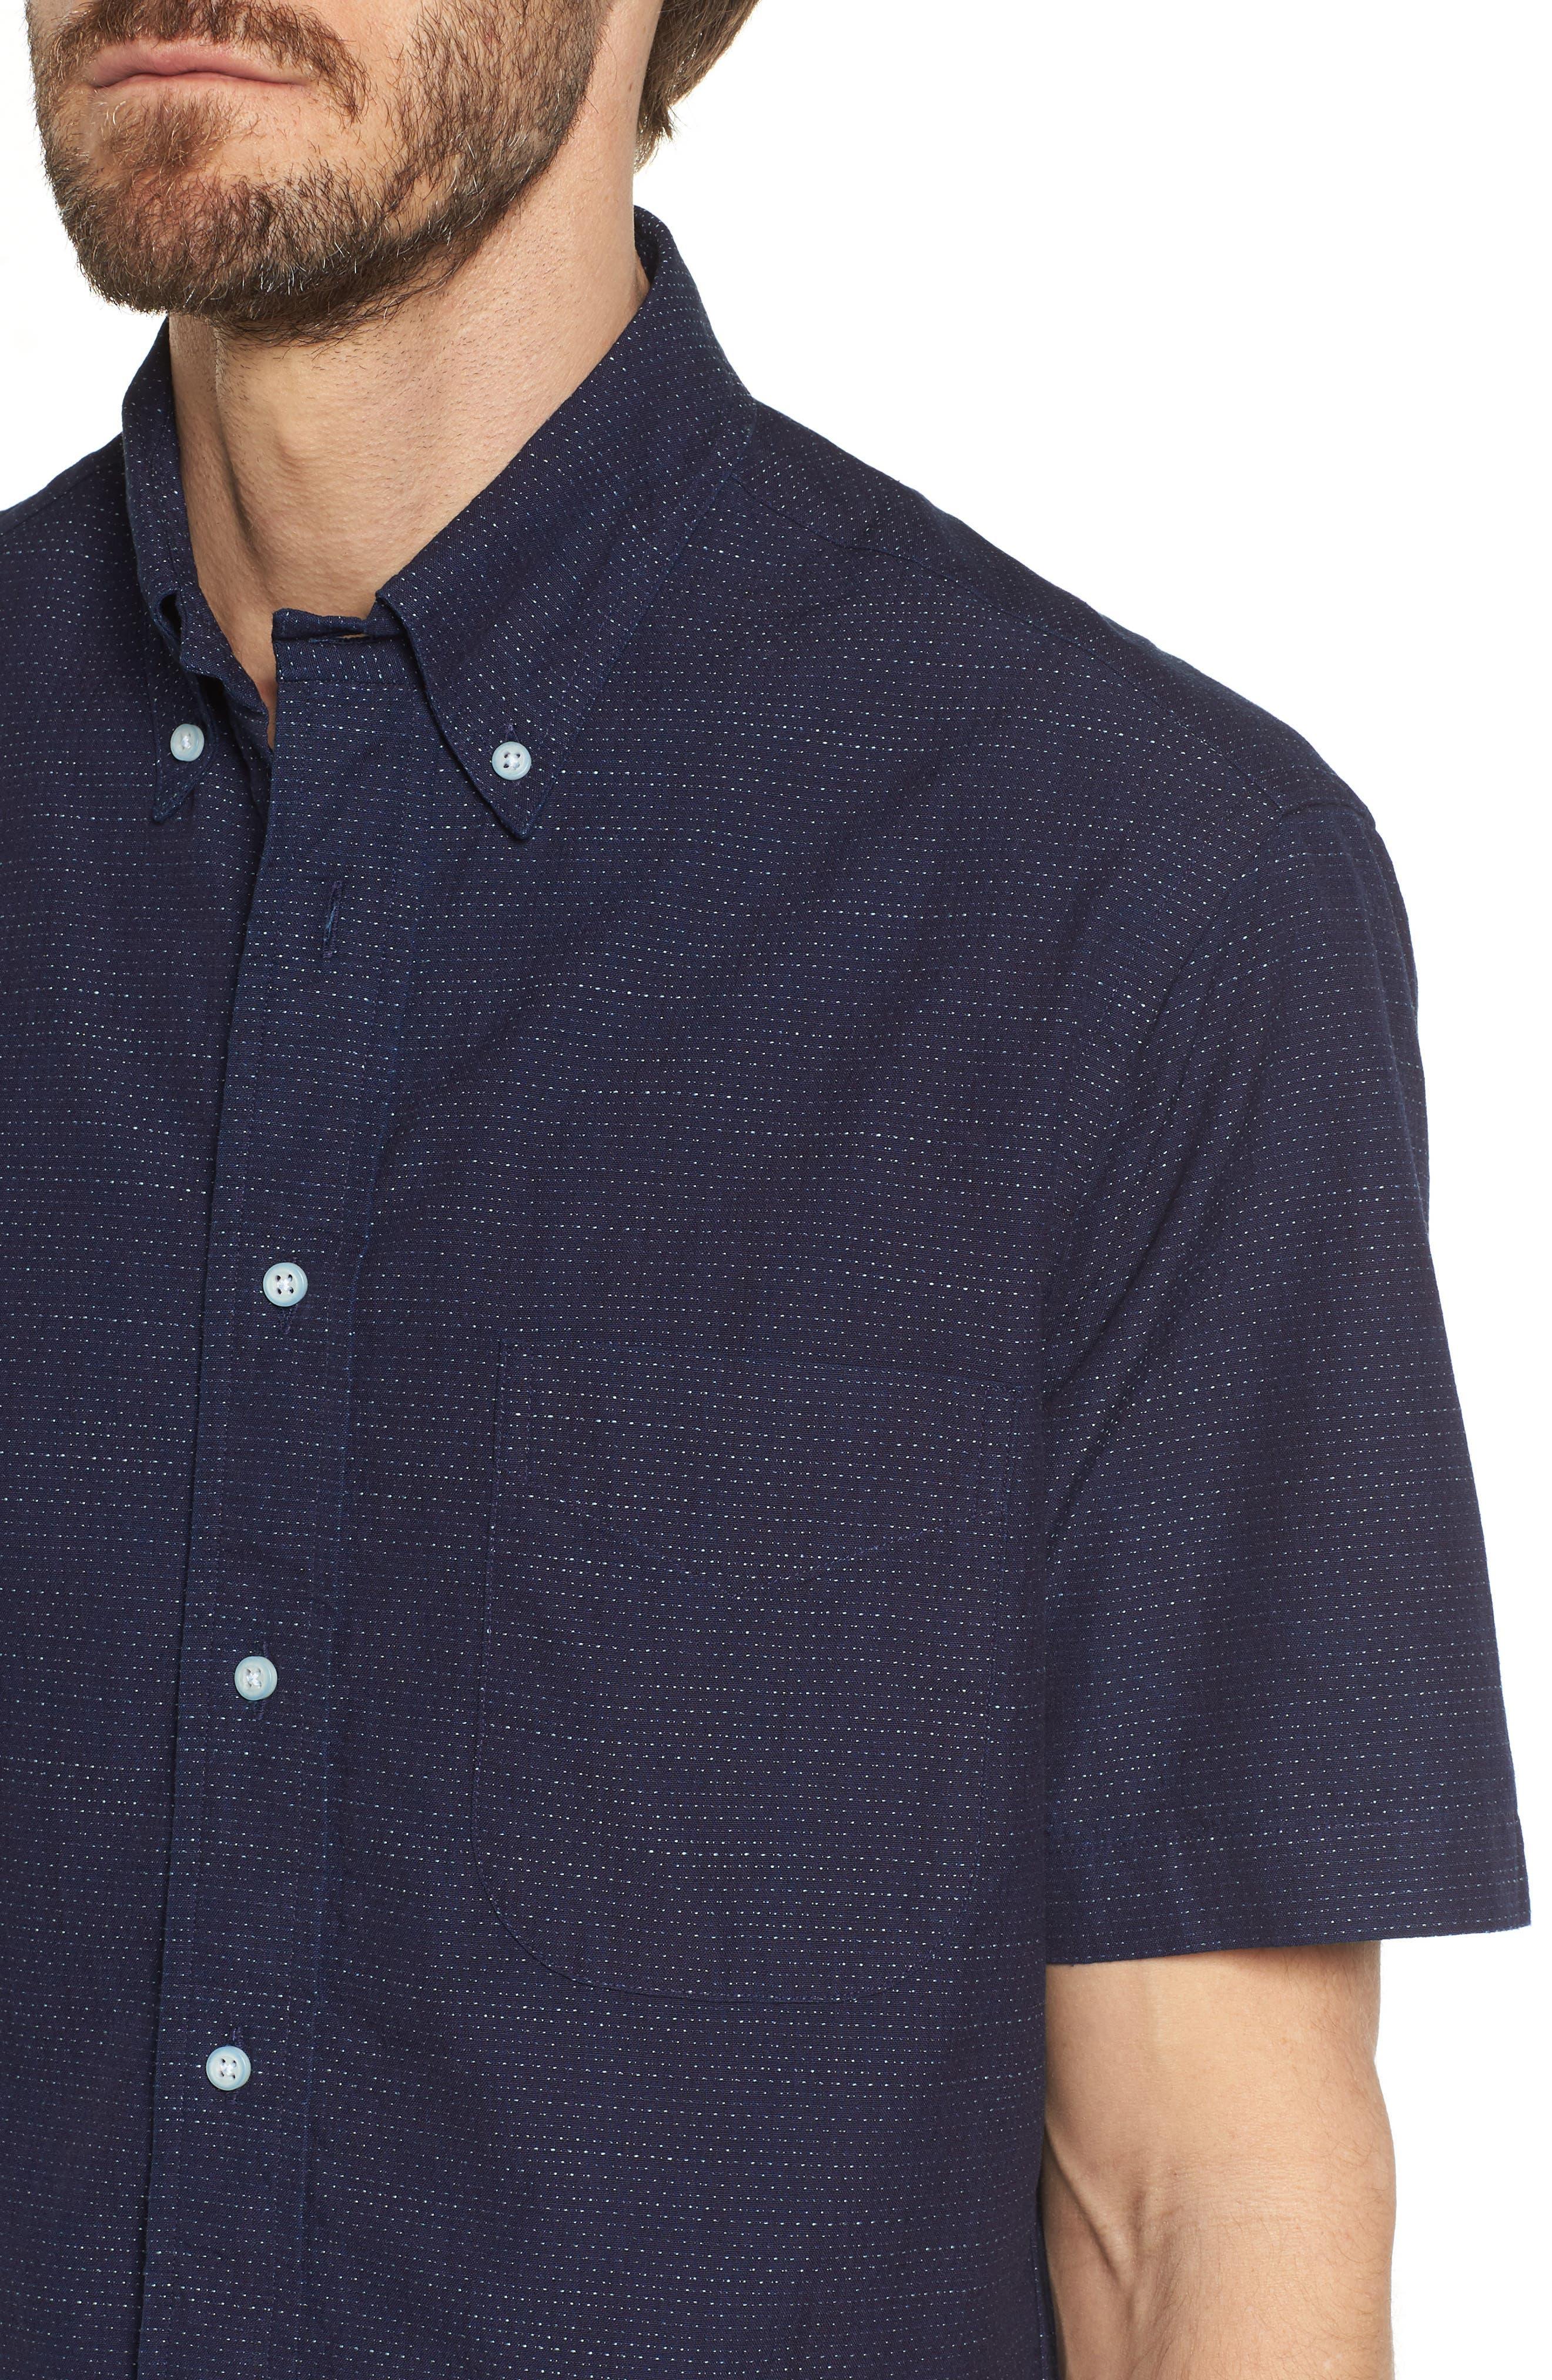 Camp Shirt,                             Alternate thumbnail 4, color,                             400